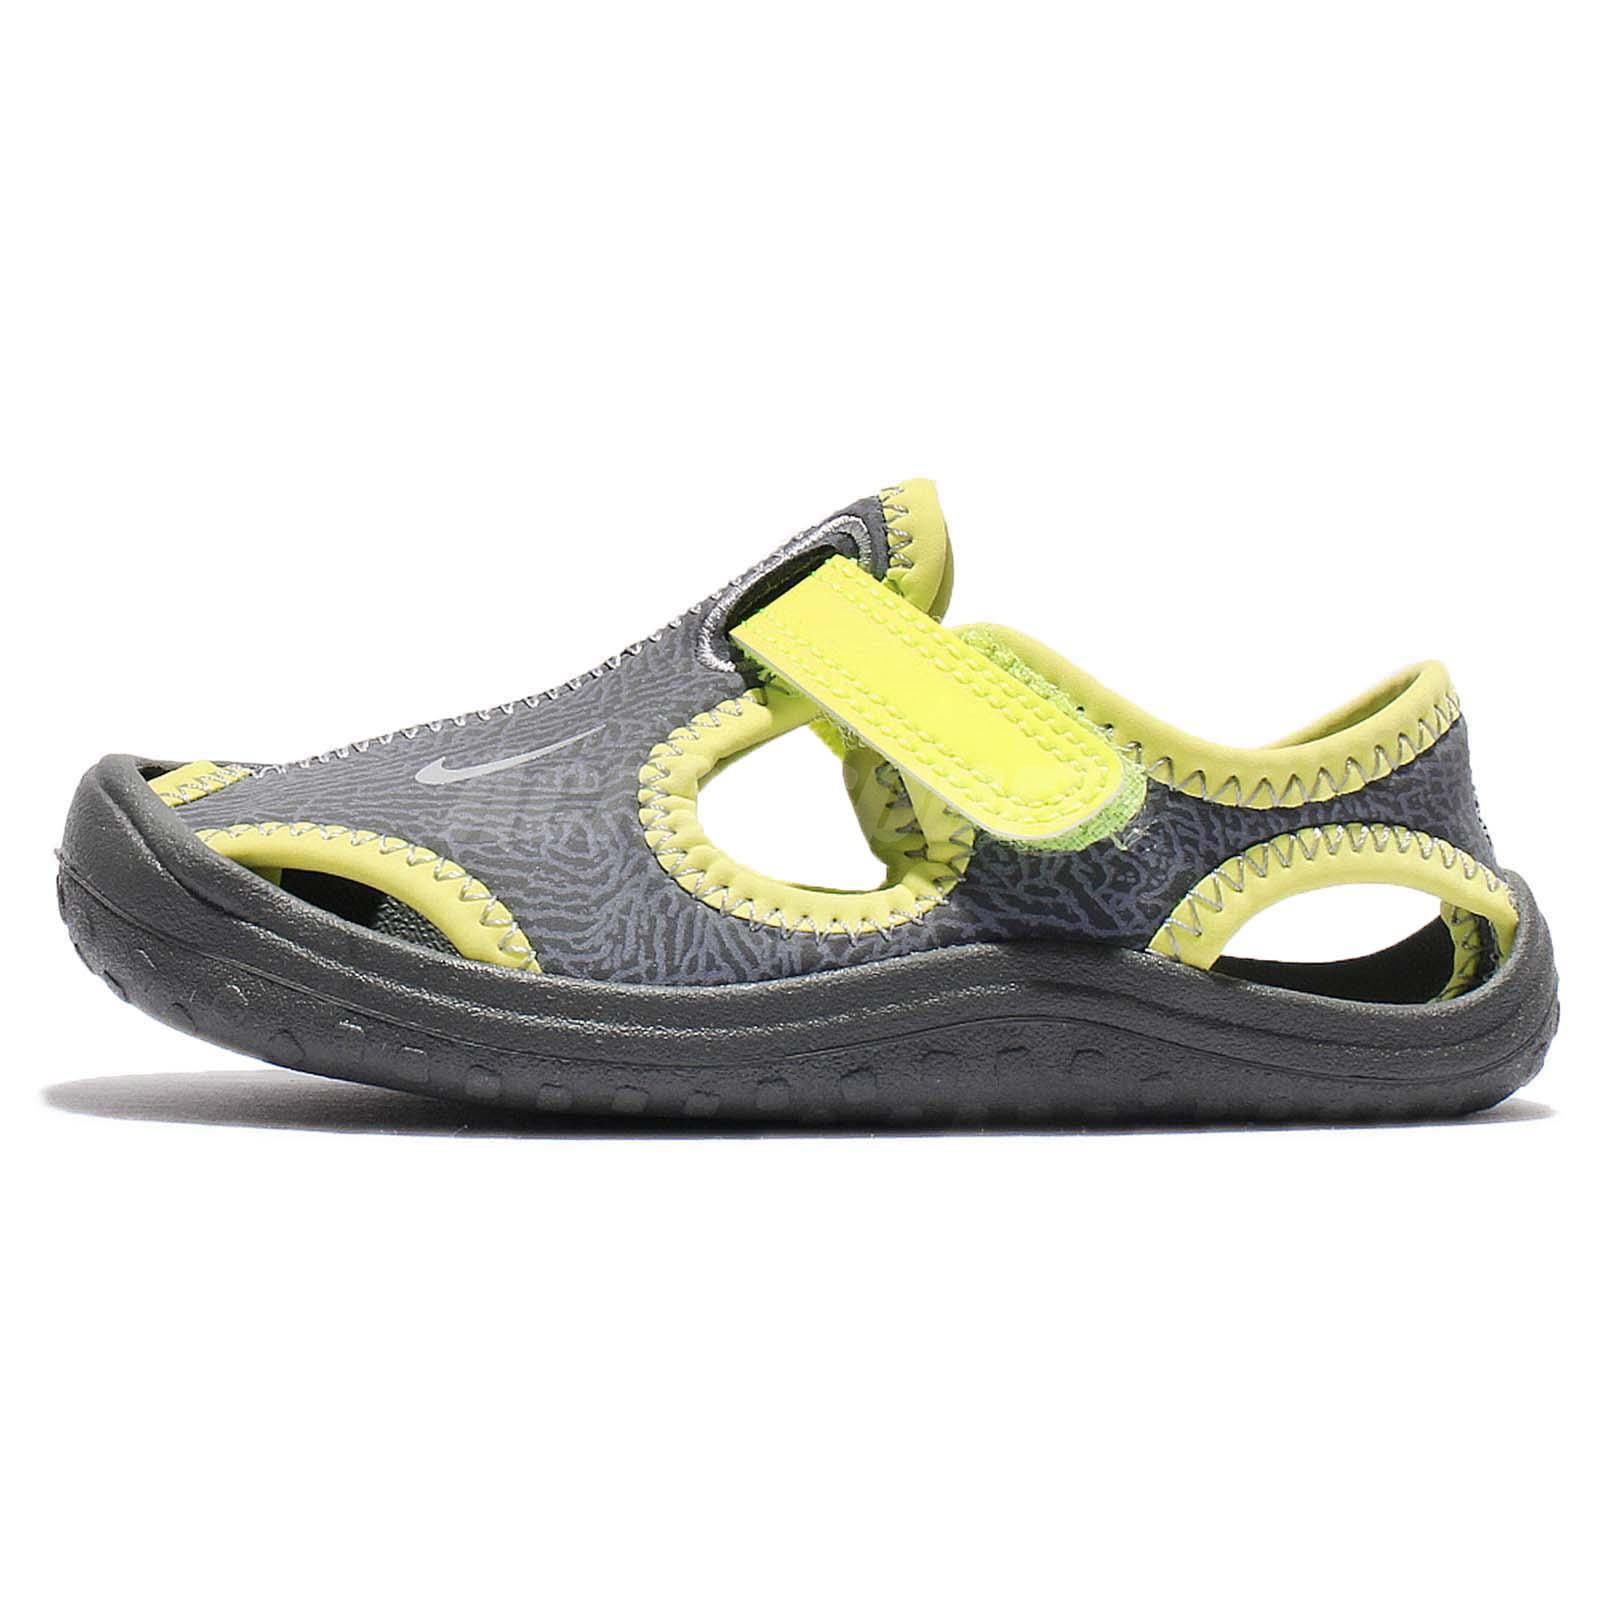 Nike Sunray Protect Td Volt Toddler Baby Infant Sandal